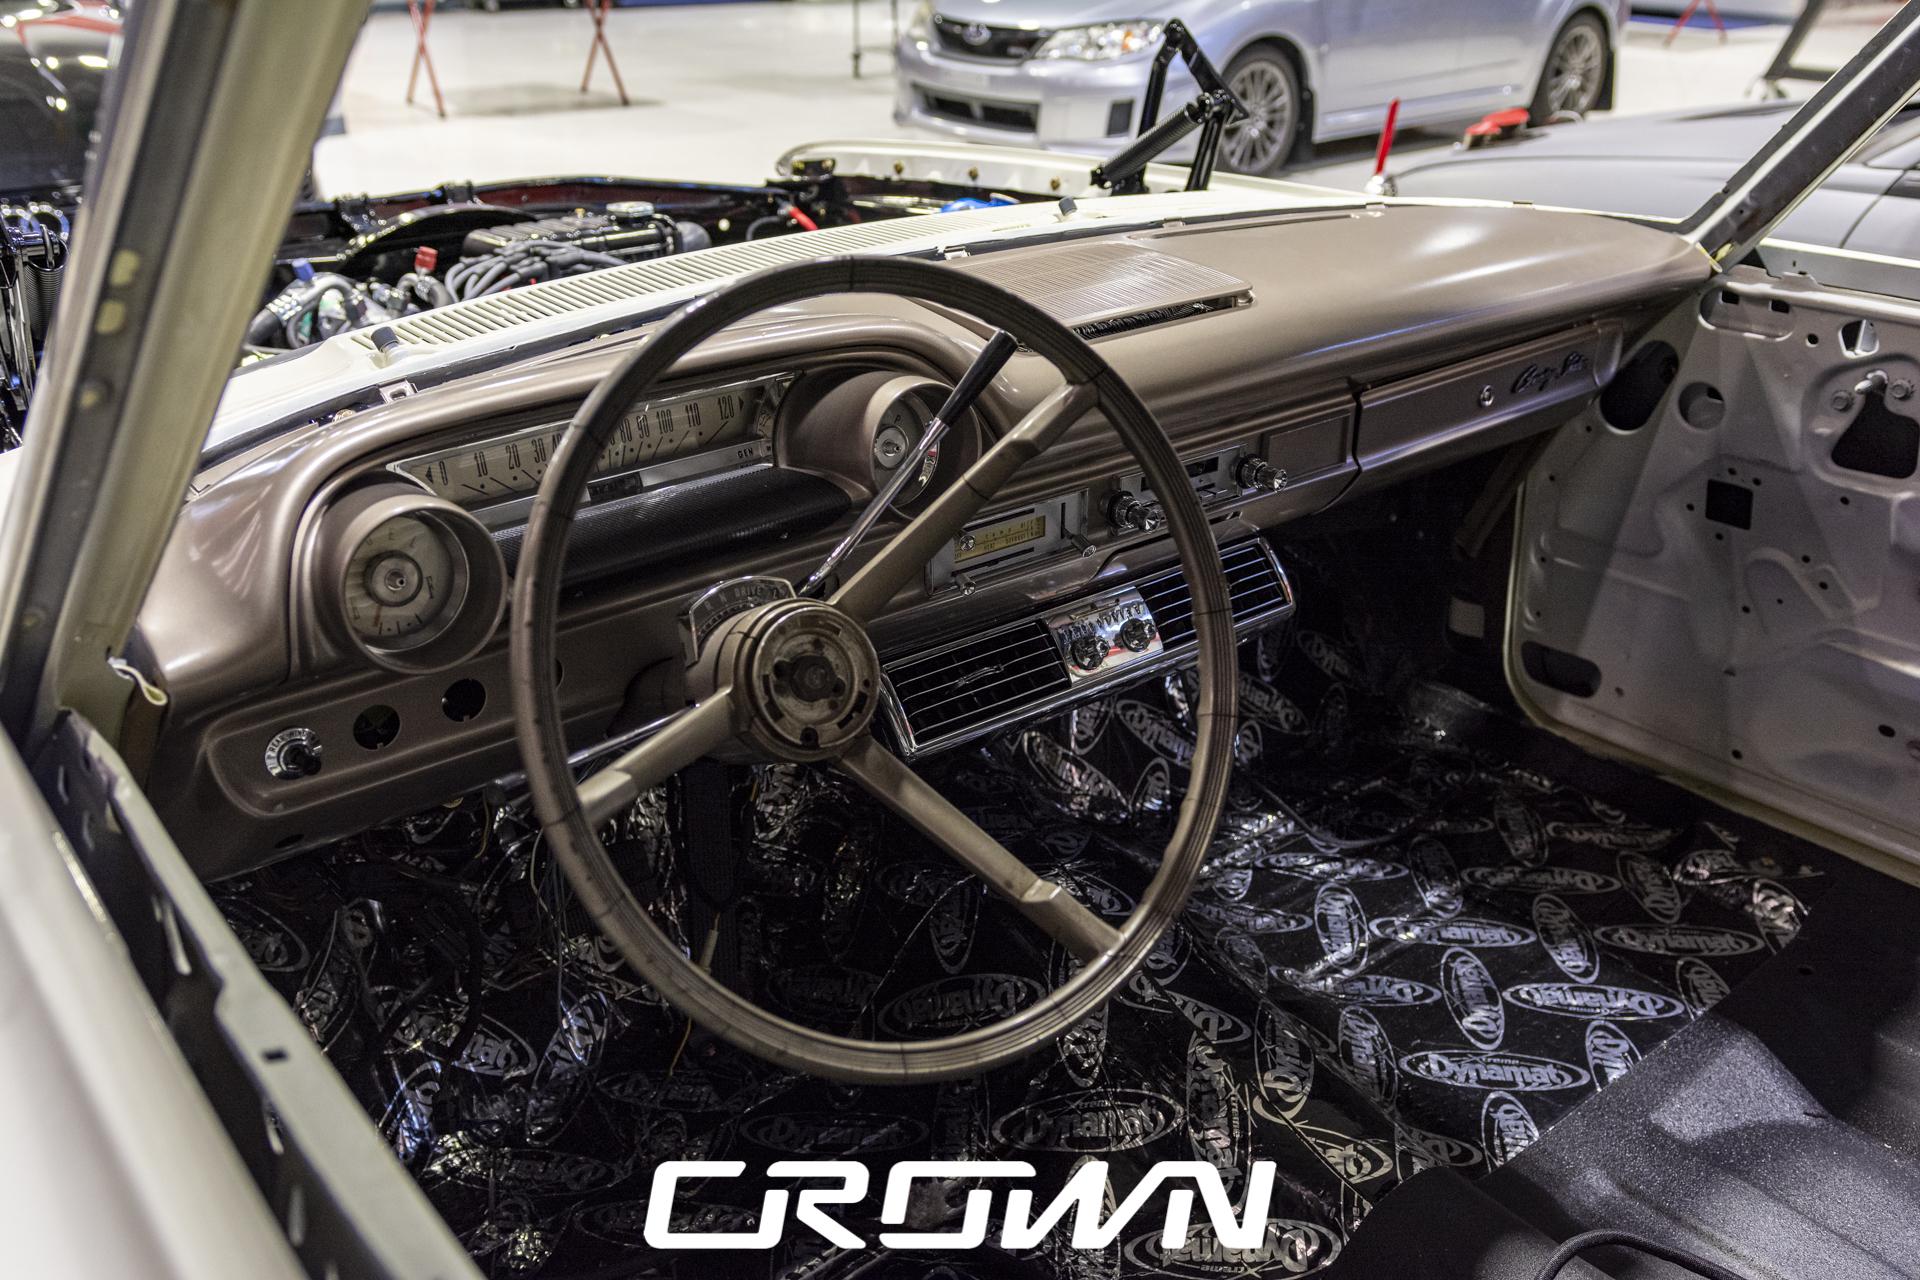 1964 Ford Country Sedan Interior 1965 Ford Country Sedan Interior